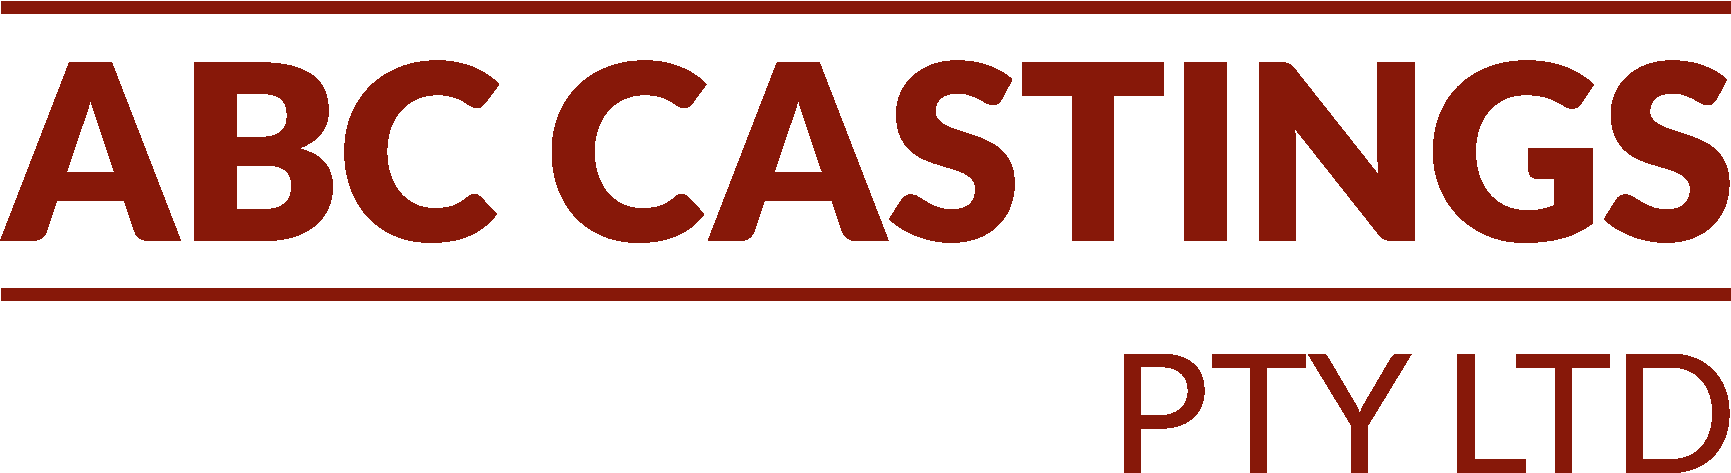 abc castings pty ltd logo